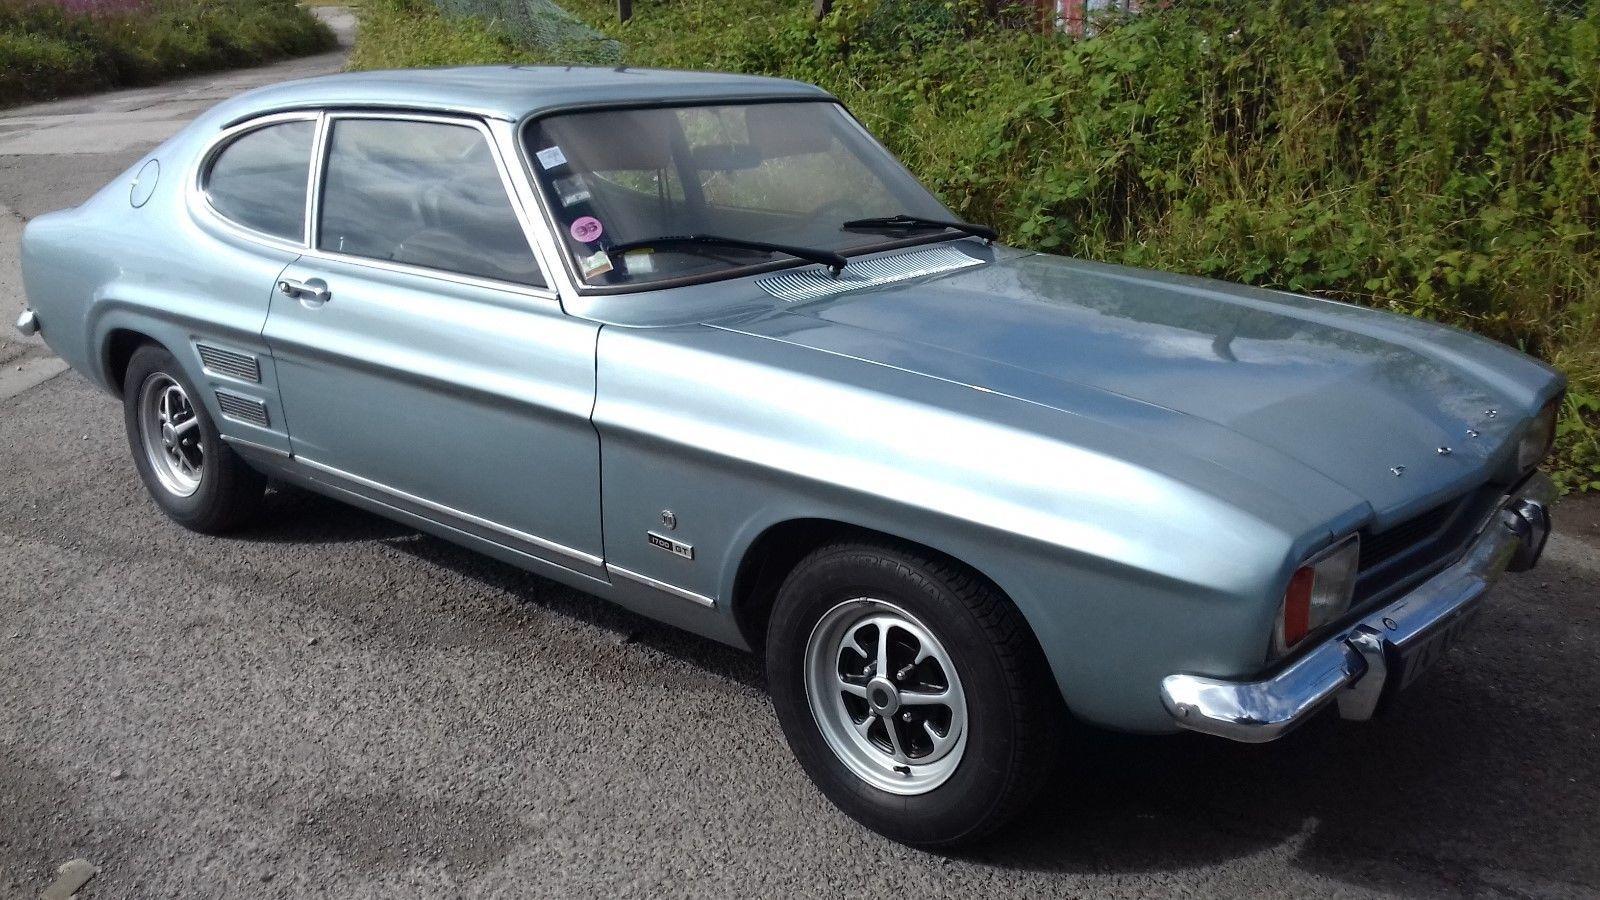 Ebay 1969 Ford Capri 1700 Gt Lhd Unbelievable Garage Find